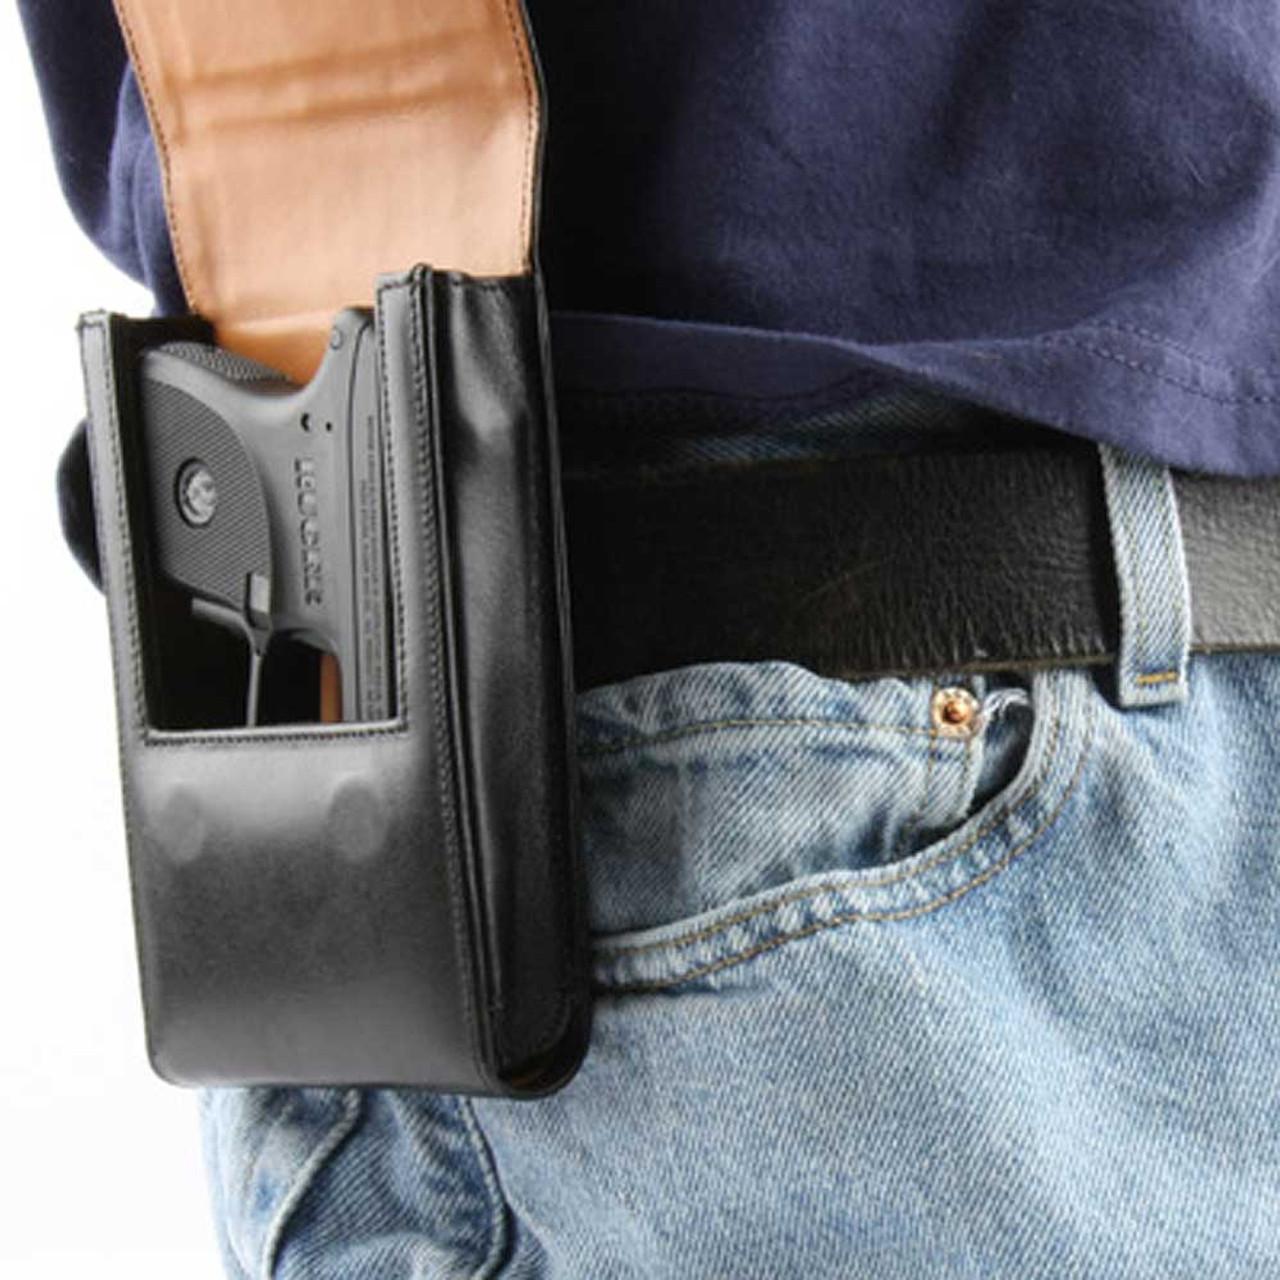 Glock 27 Concealed Carry Holster (Belt Loop)